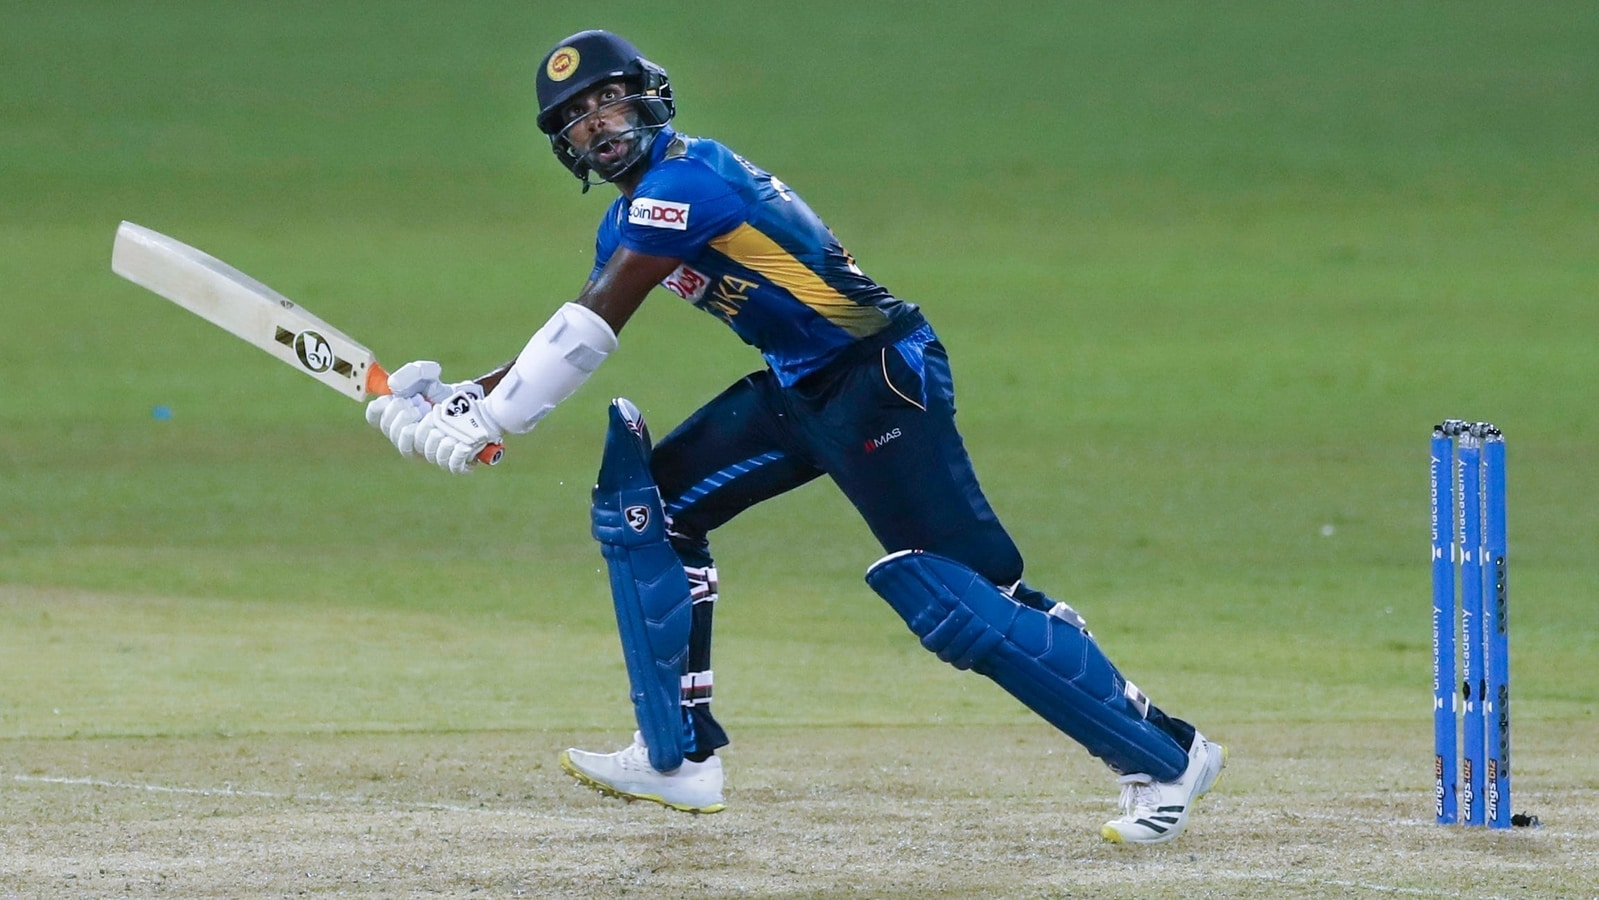 India 'top team', we knew they would attack us: Sri Lanka's Chamika  Karunaratne | Cricket - Hindustan Times